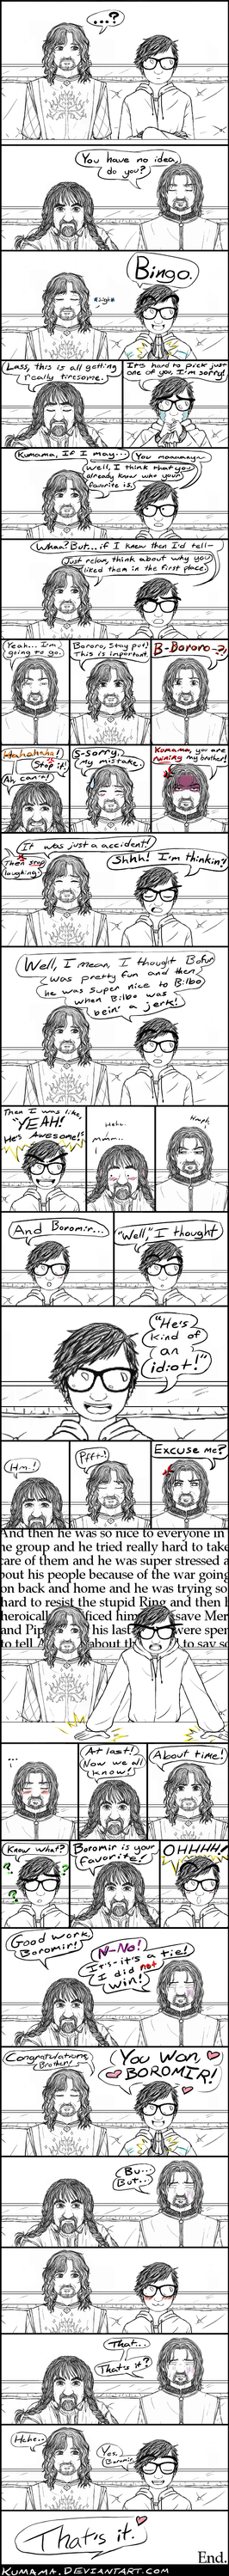 Comic: HOBBIT vs LOTR 7 by Kumama